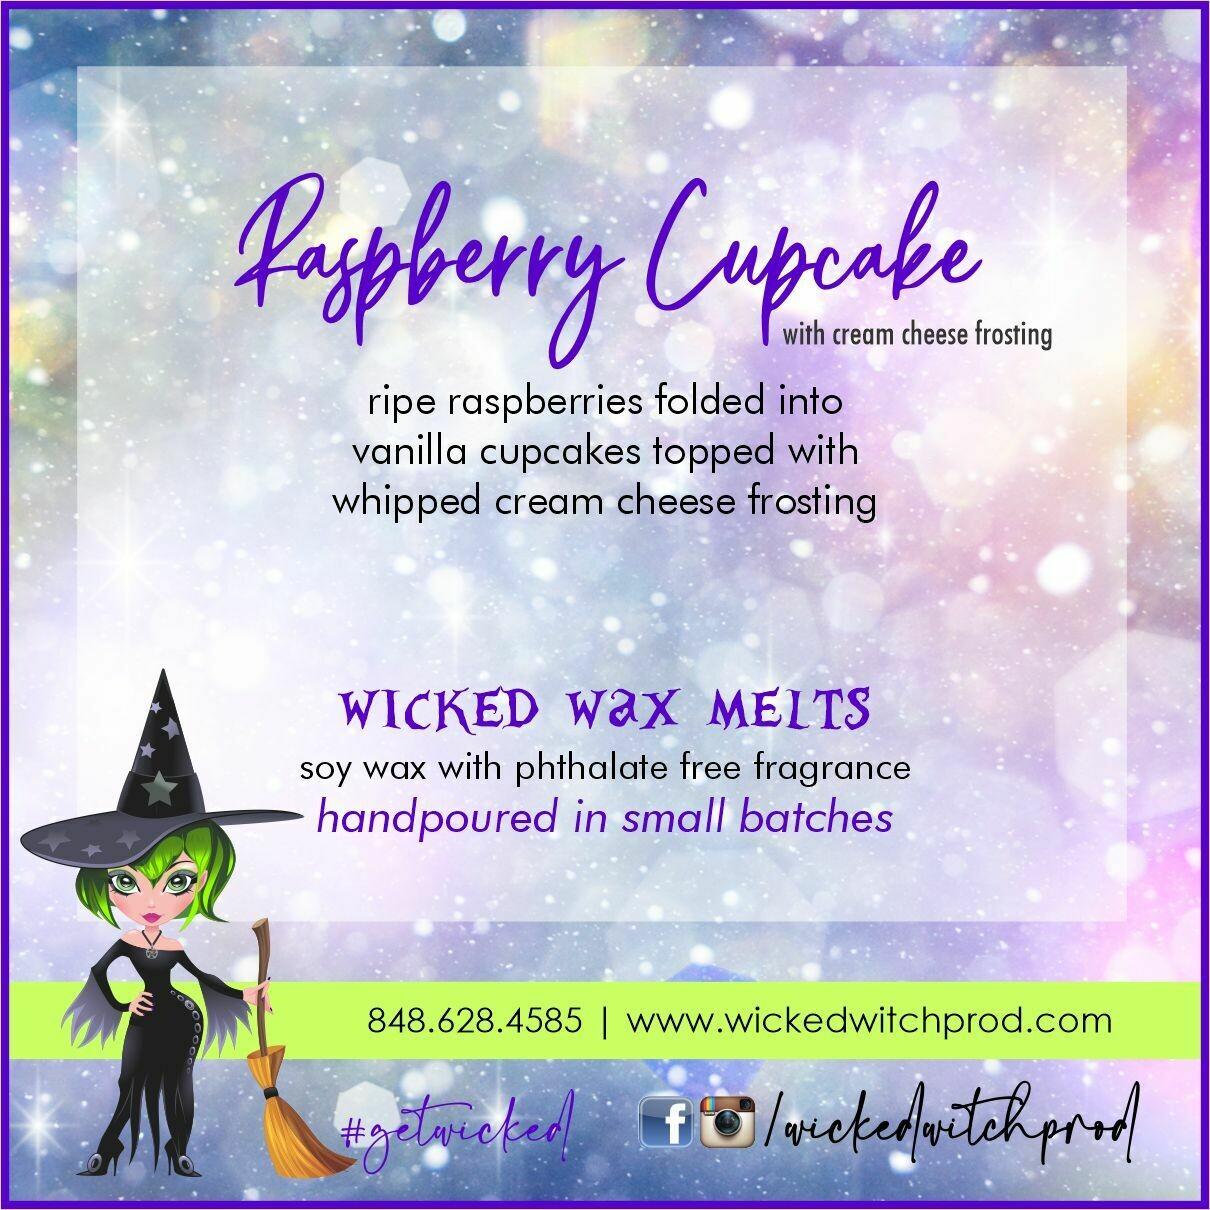 Raspberry Cupcake Wicked Wax Melts